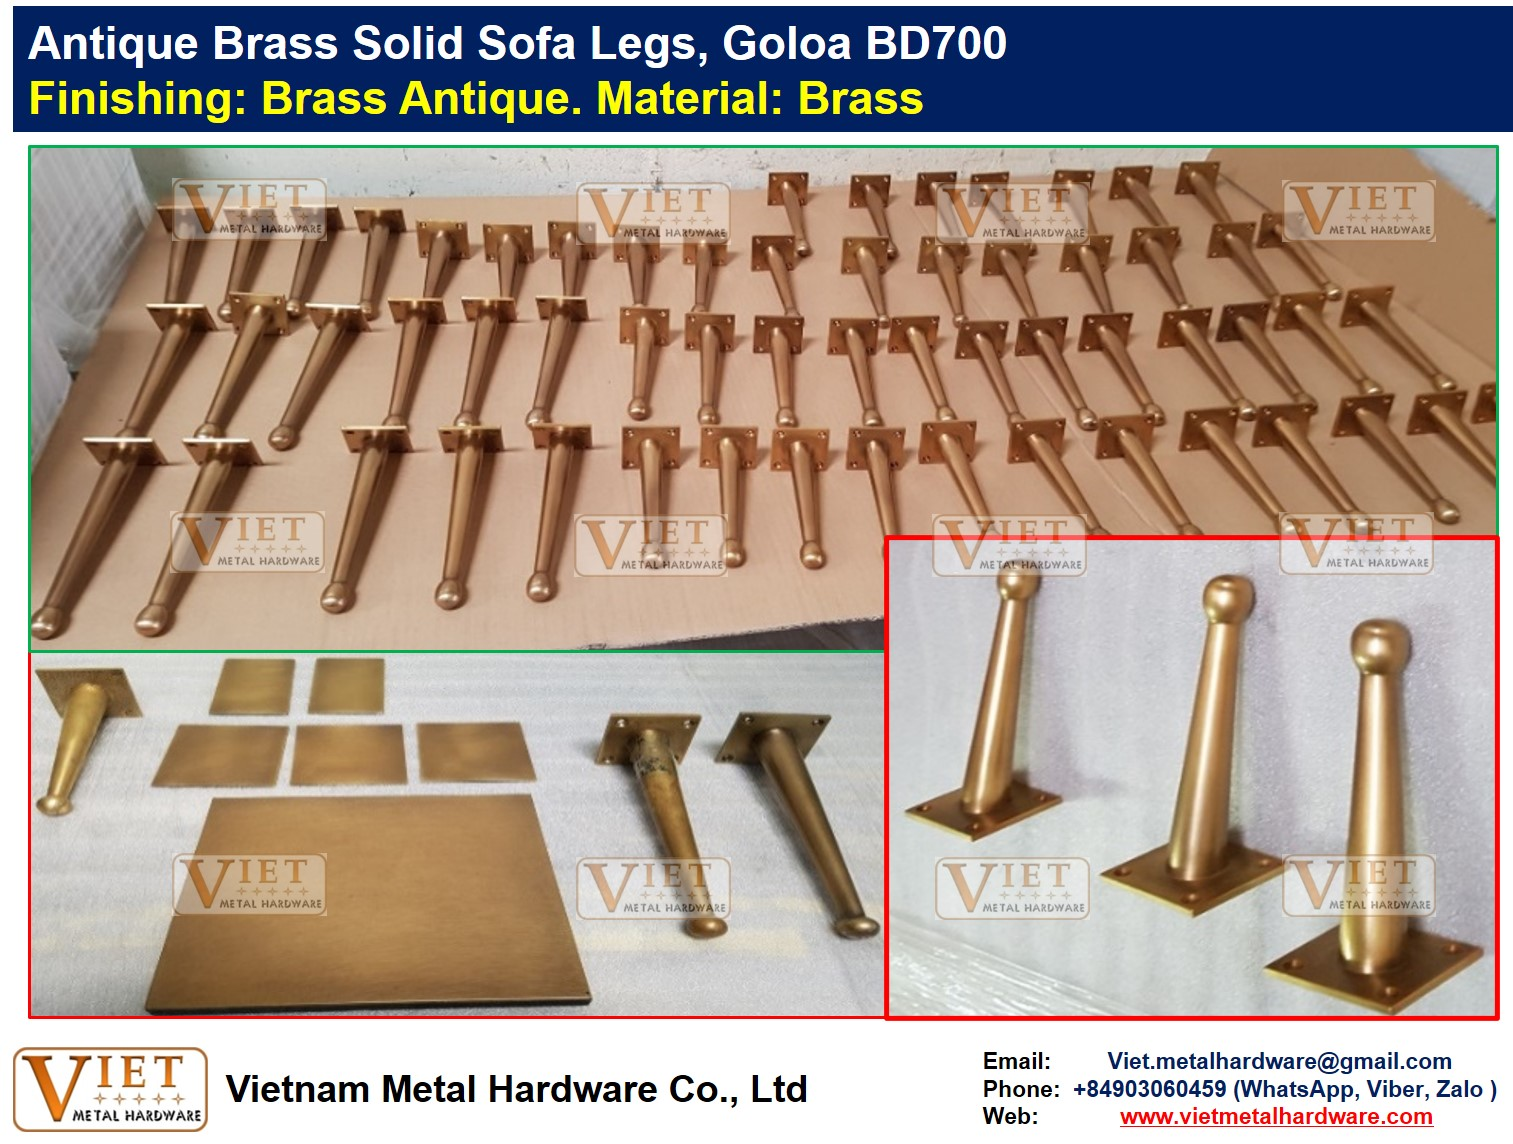 Antique Brass Solid Sofa Legs, Goloa BD700